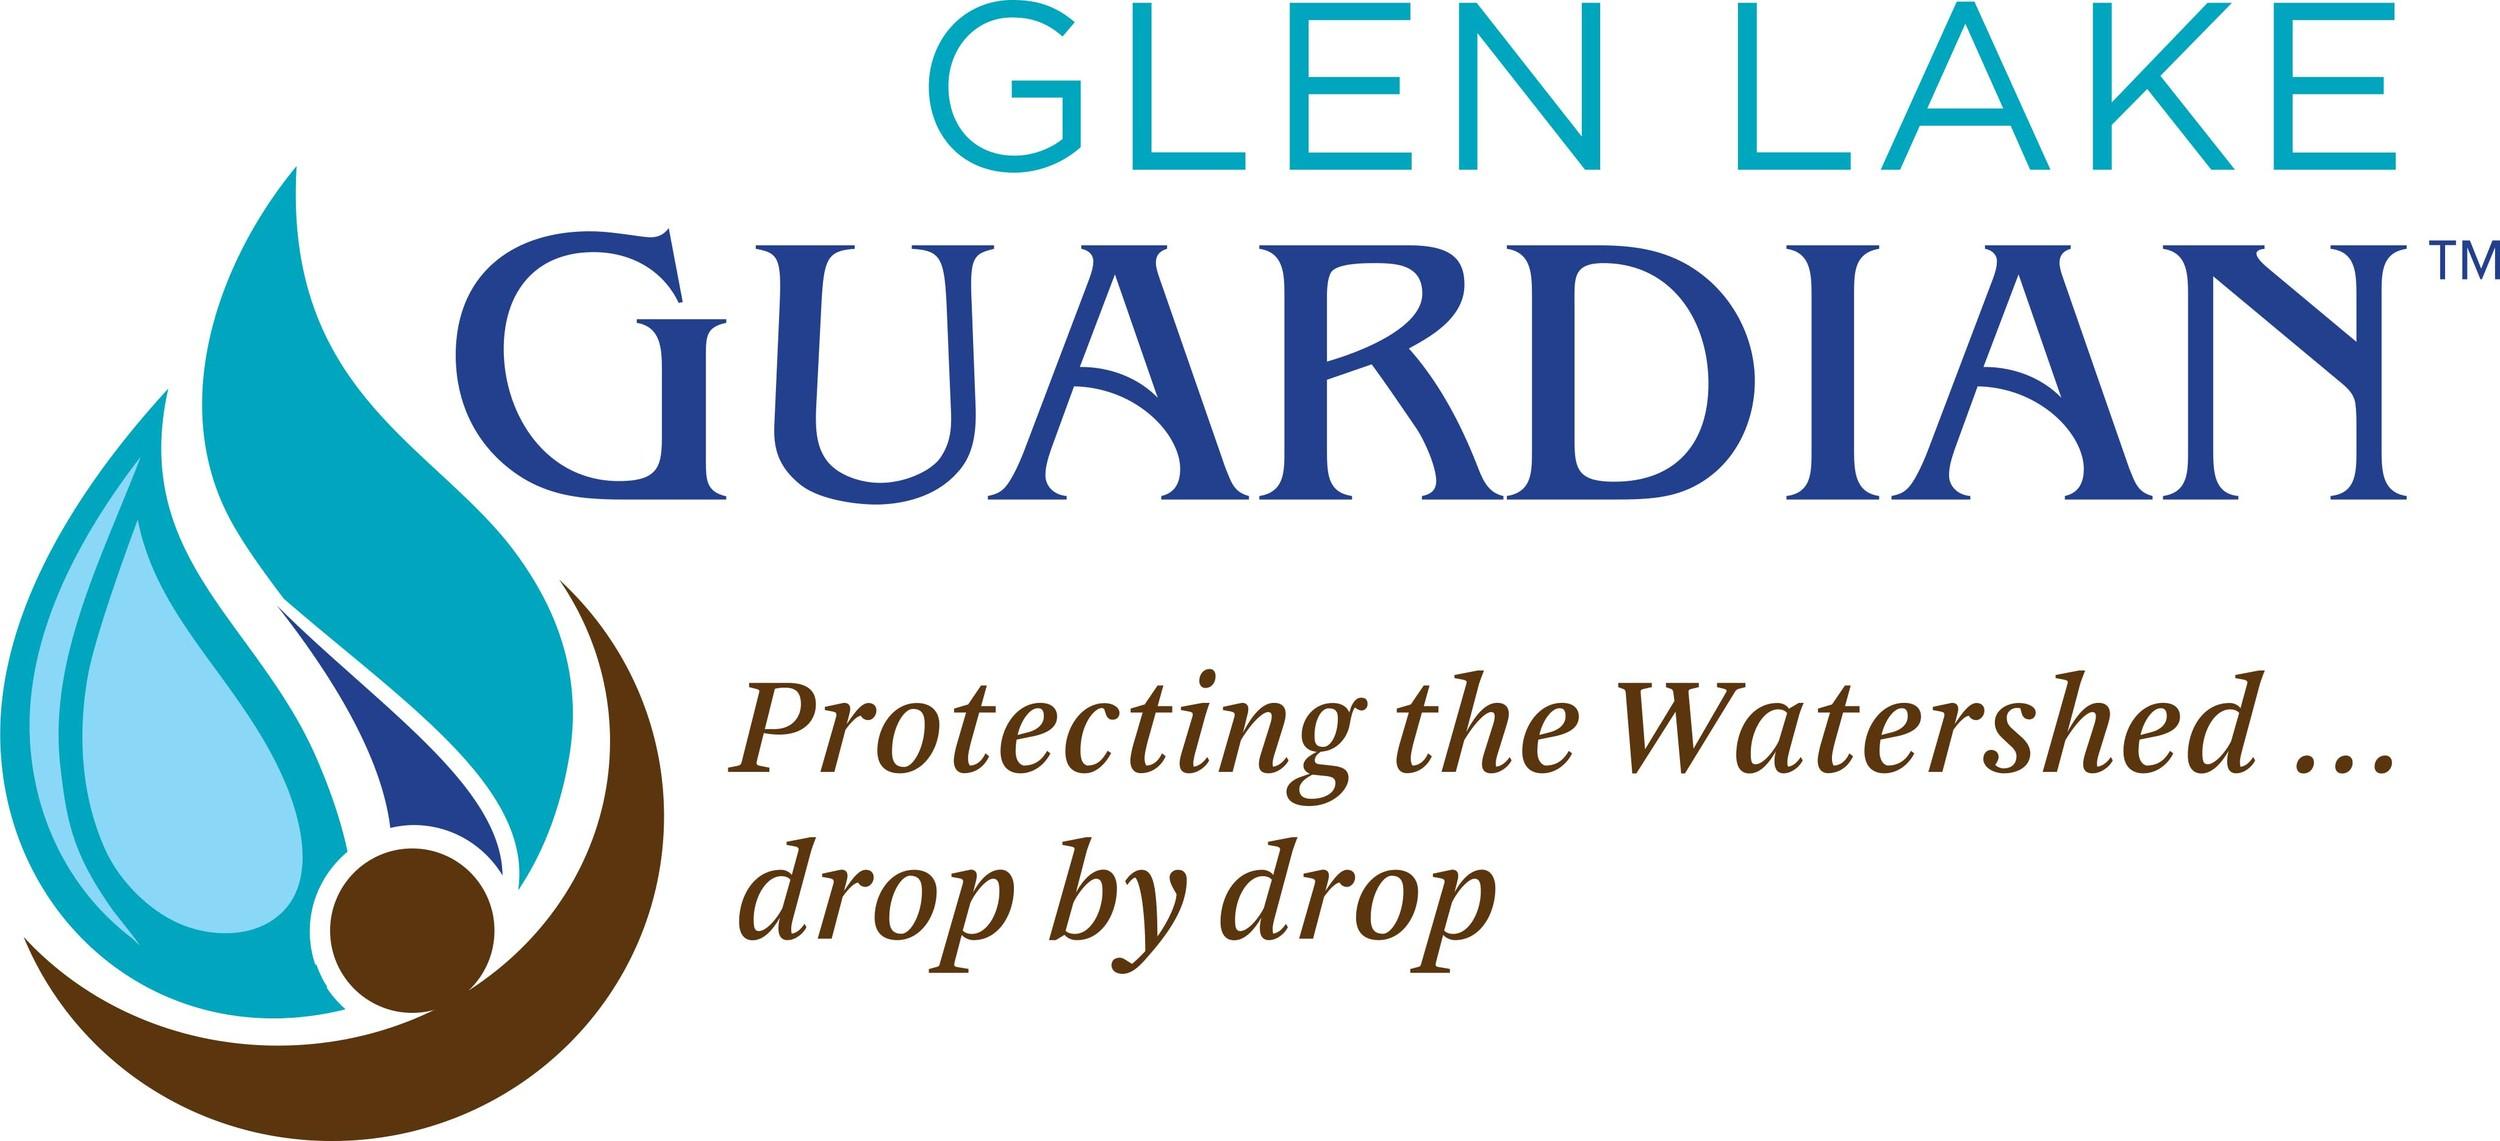 Glen Lake Association logo.jpg